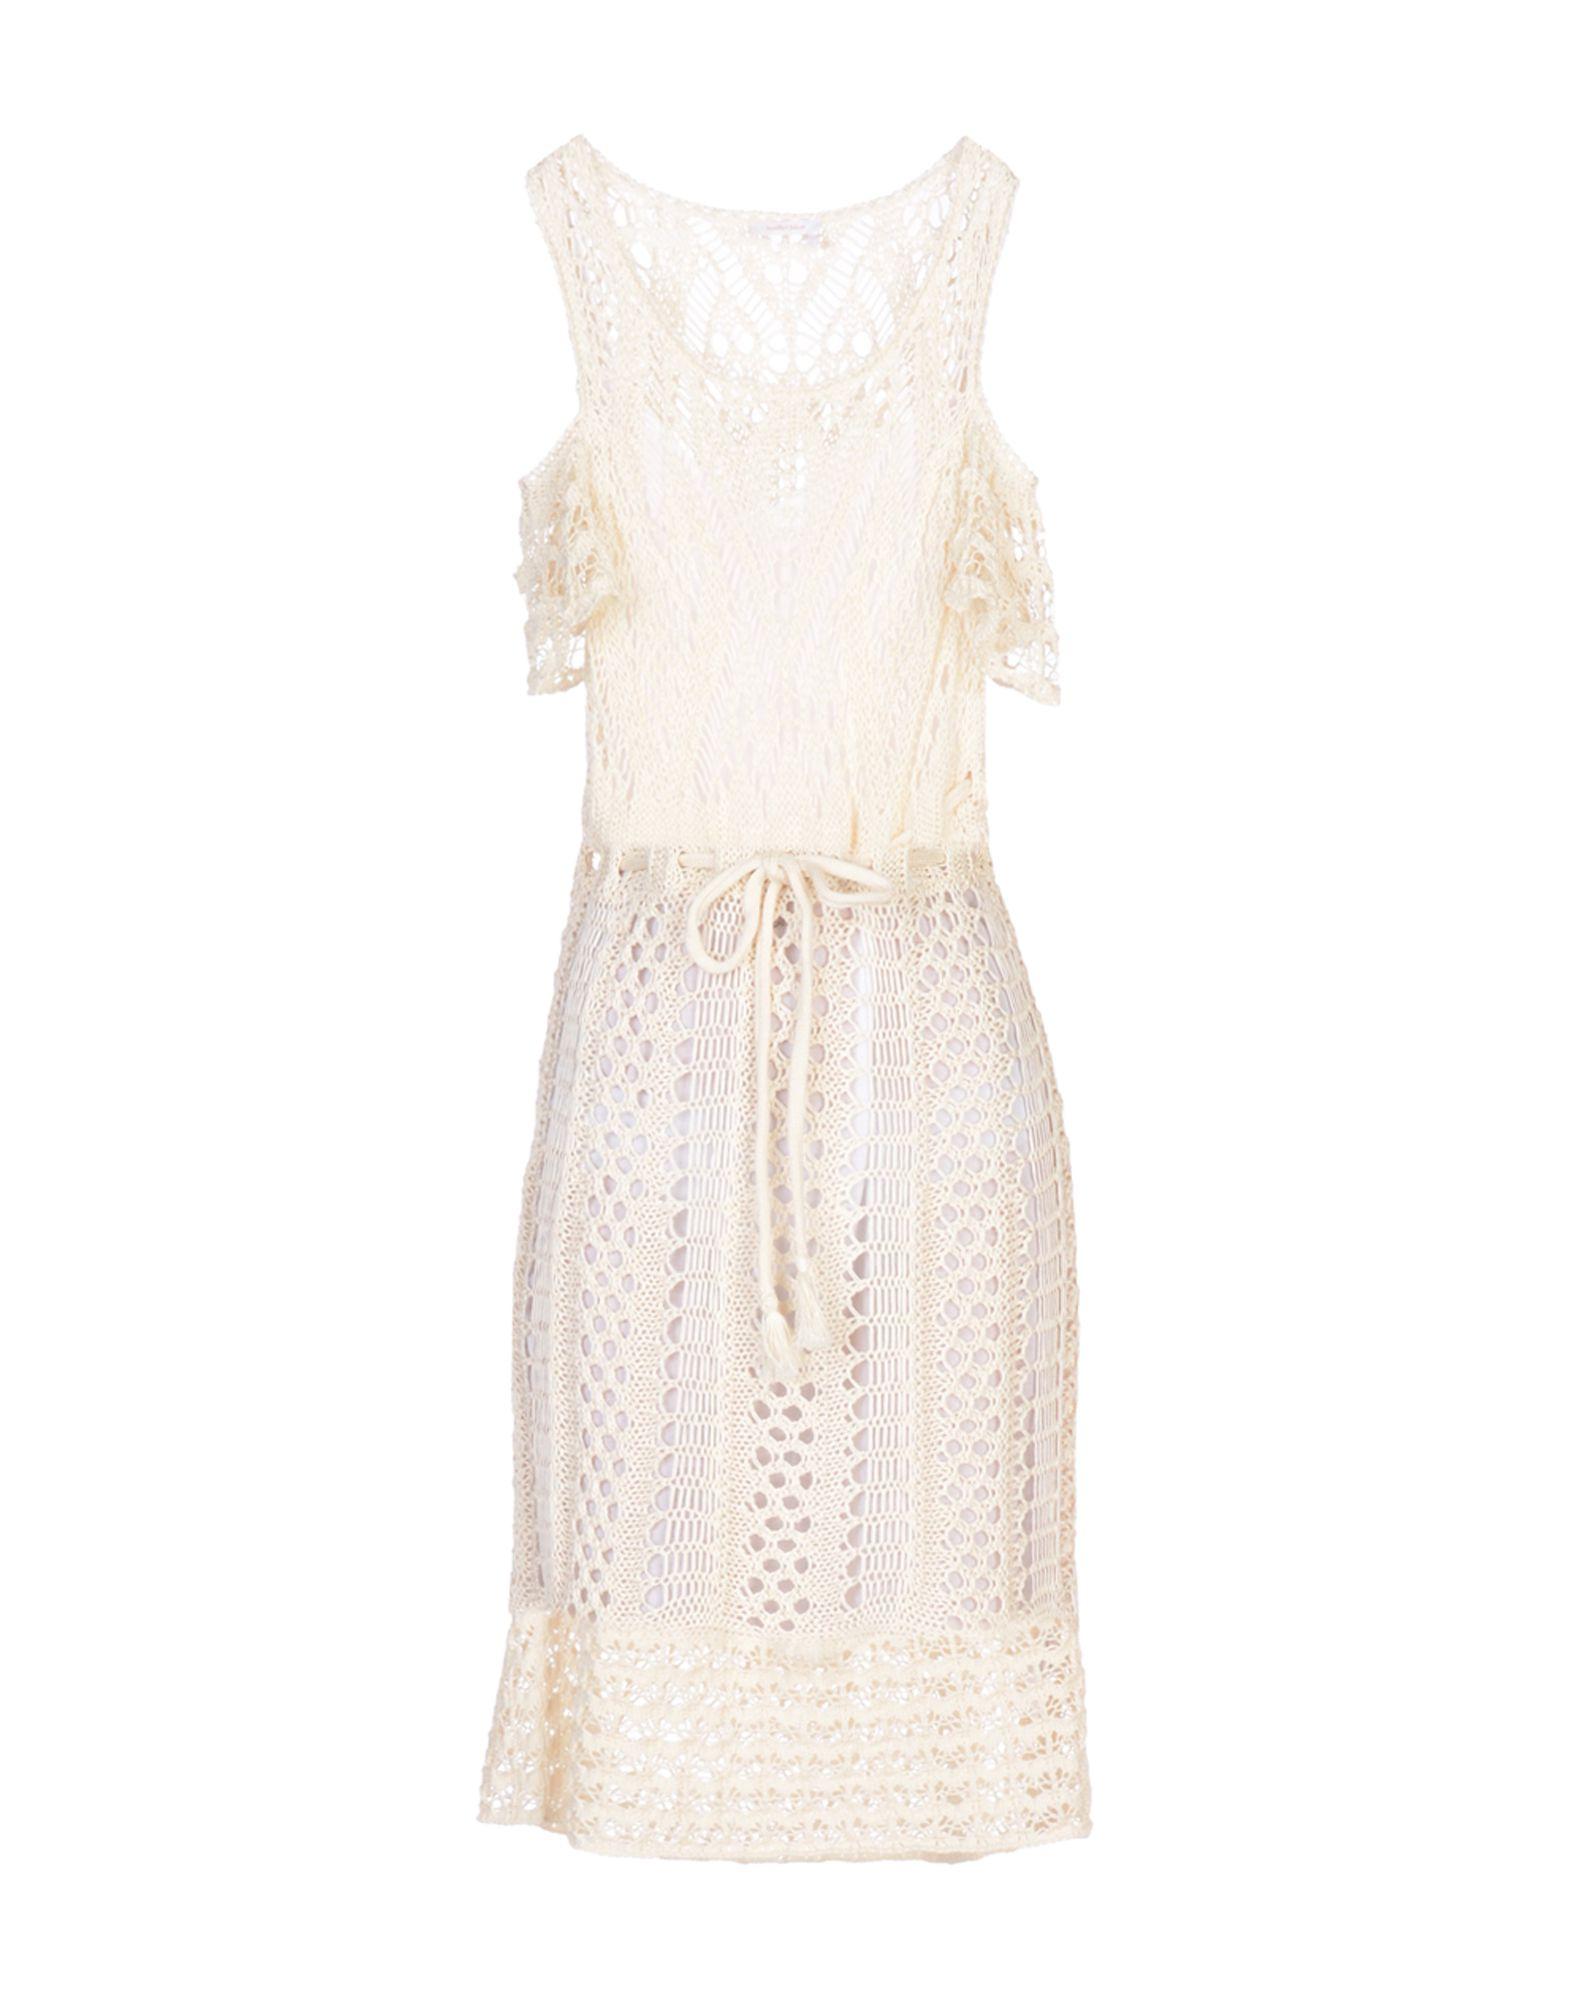 SEE BY CHLOÉ Платье длиной 3/4 lisa corti платье длиной 3 4